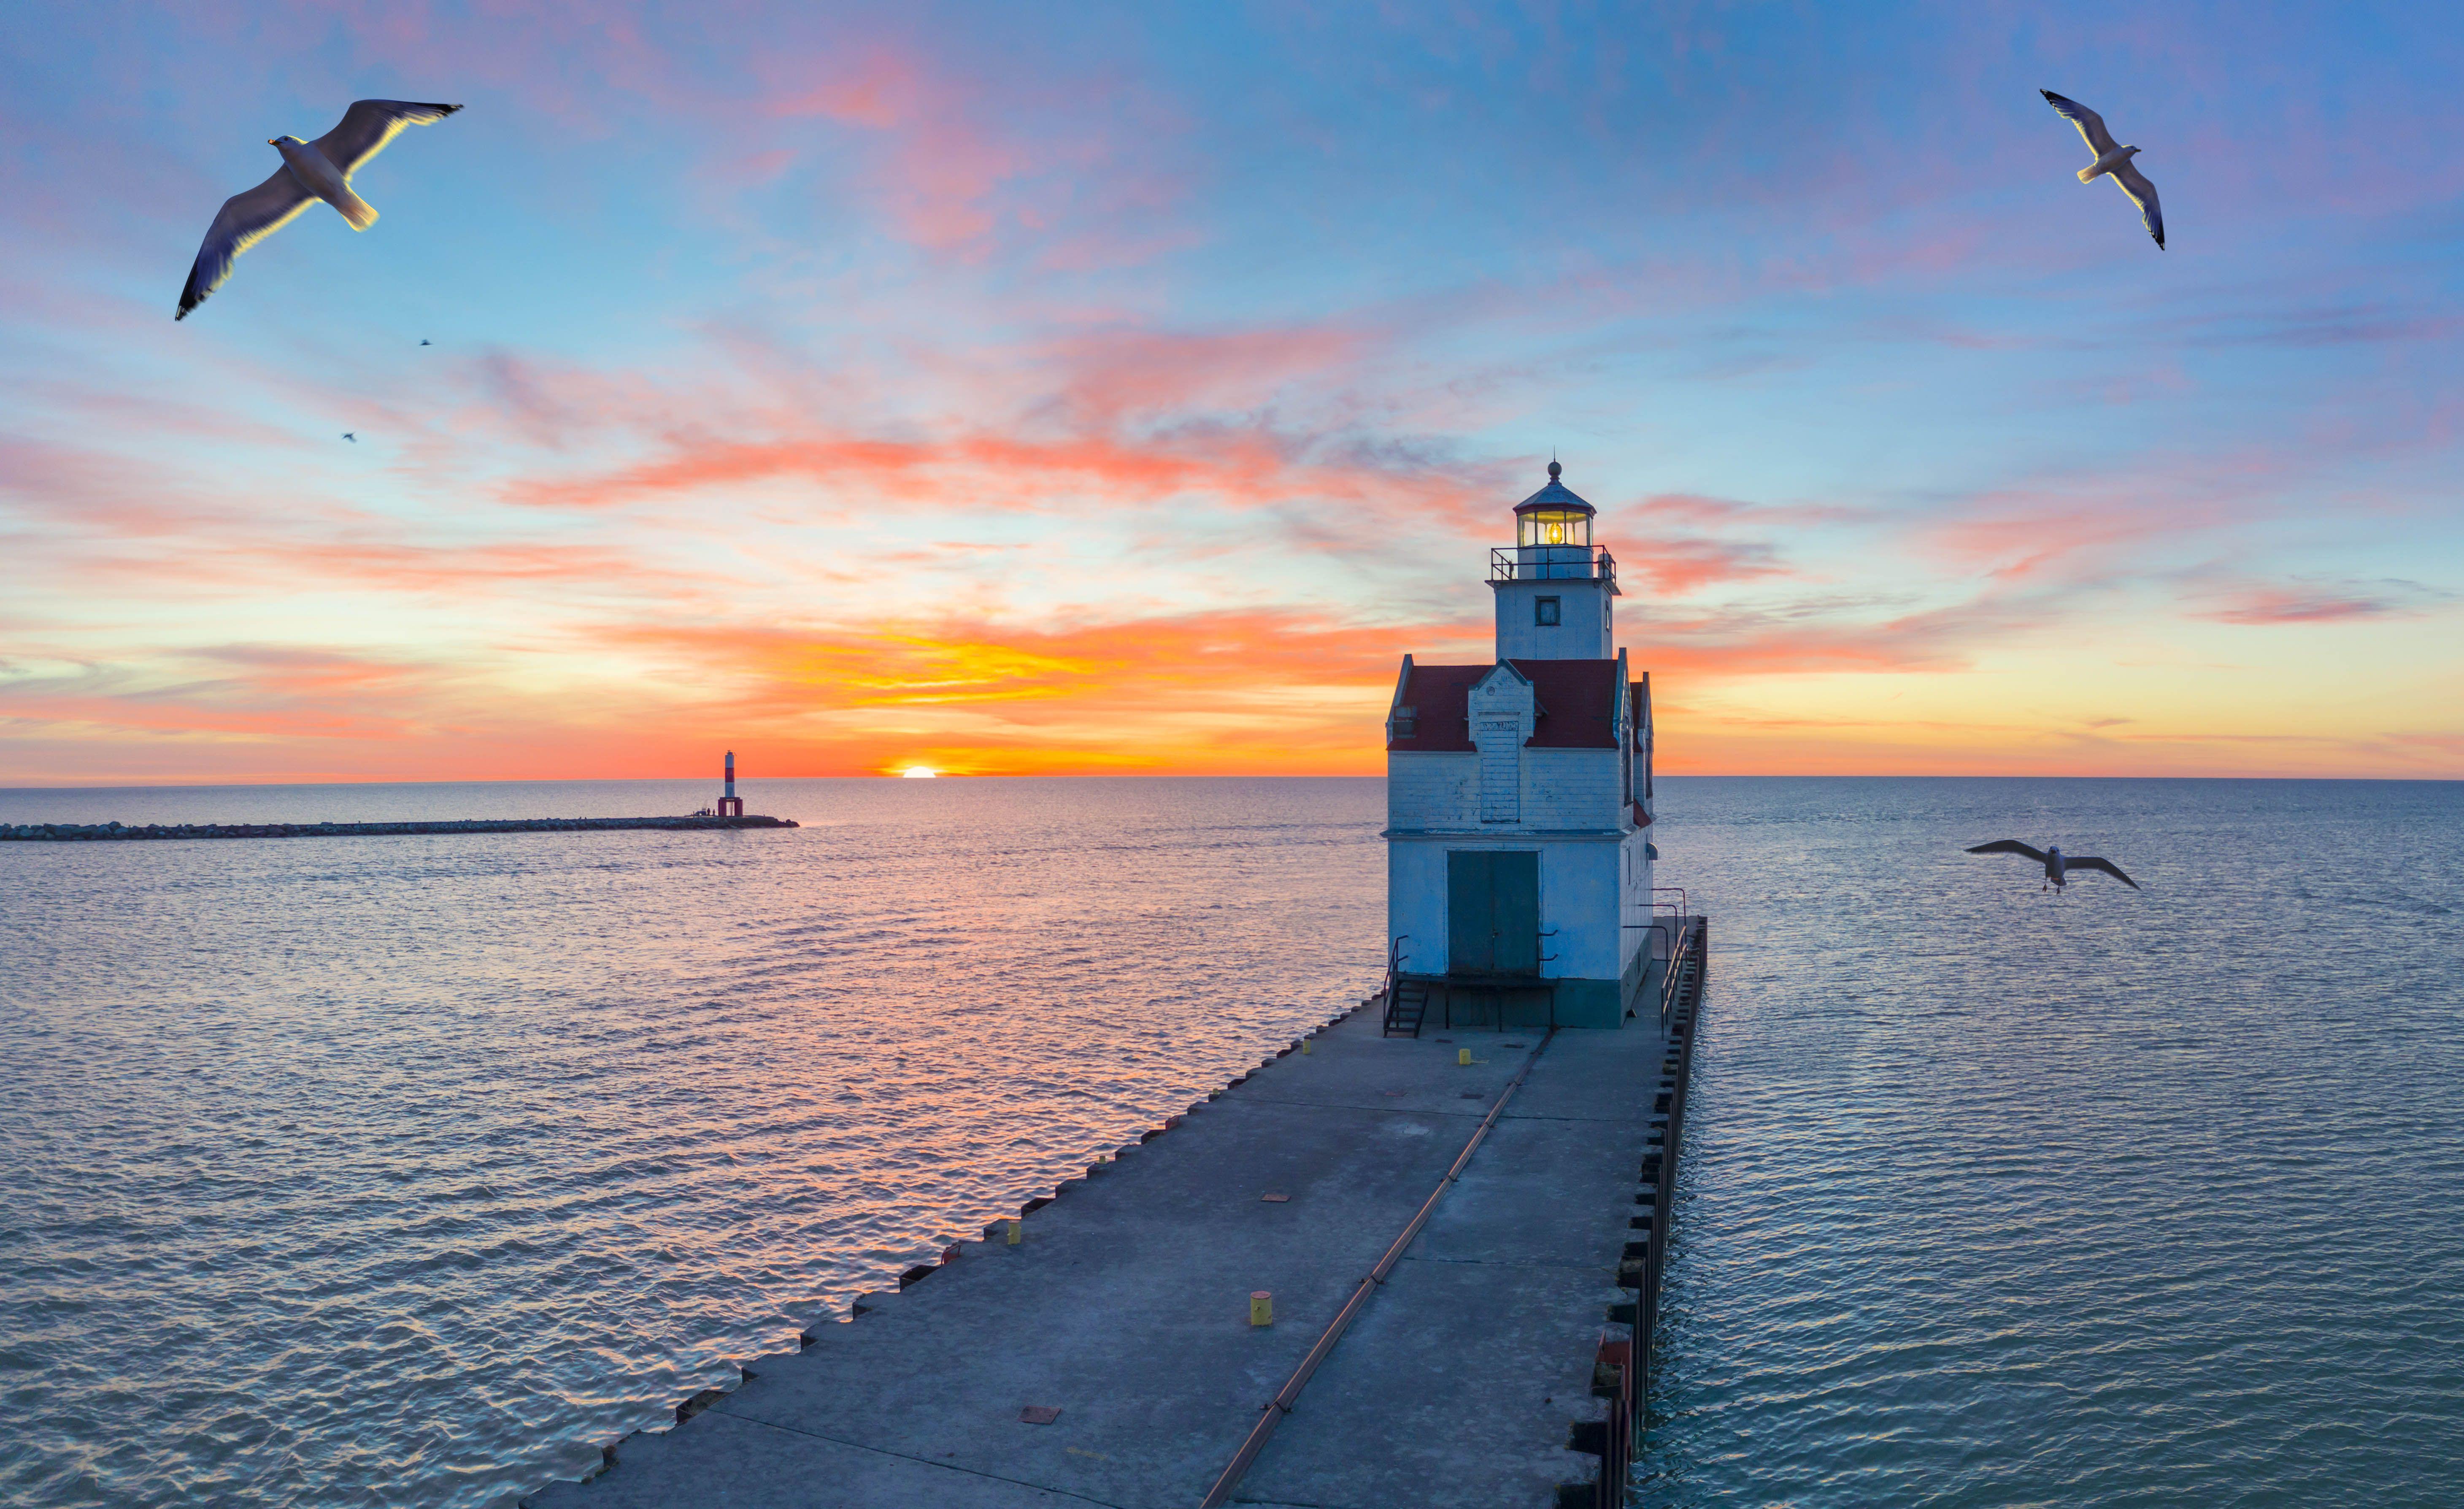 Sunrise over Lake Michigan in Wisconsin